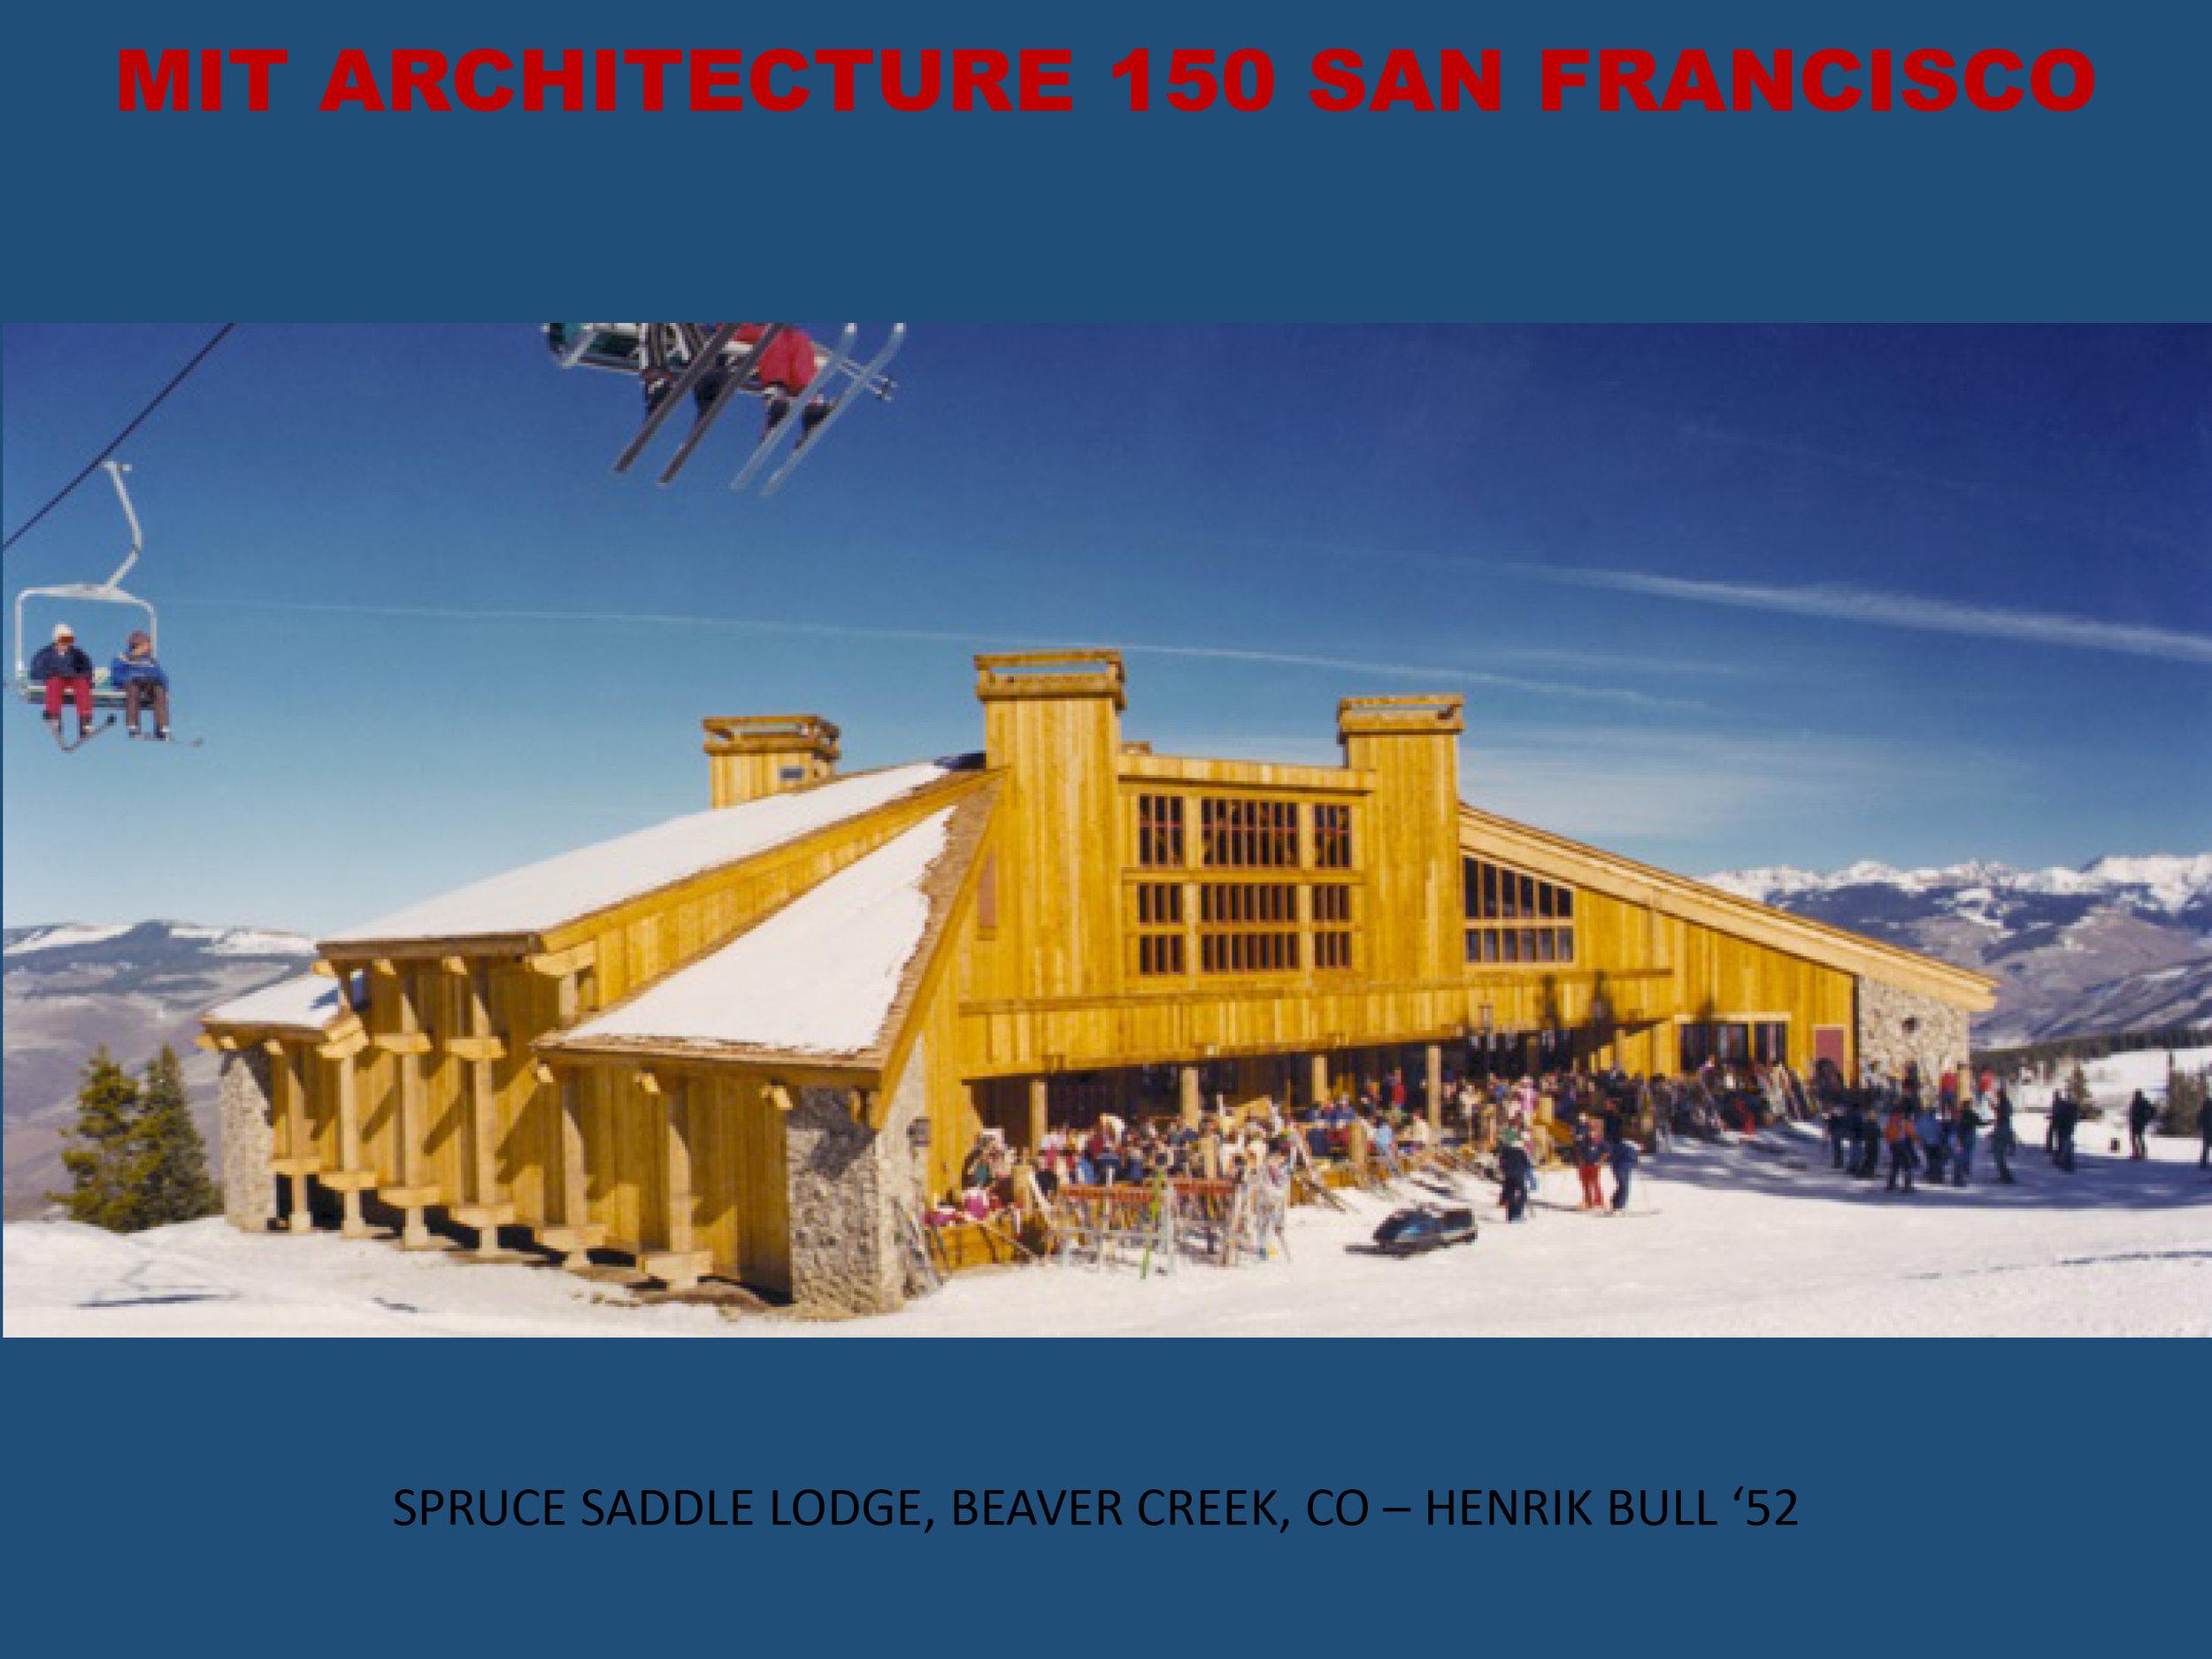 MIT ARCHITECTURE 150 SAN FRANCISCO SLIDESHOW-66 copy.jpg